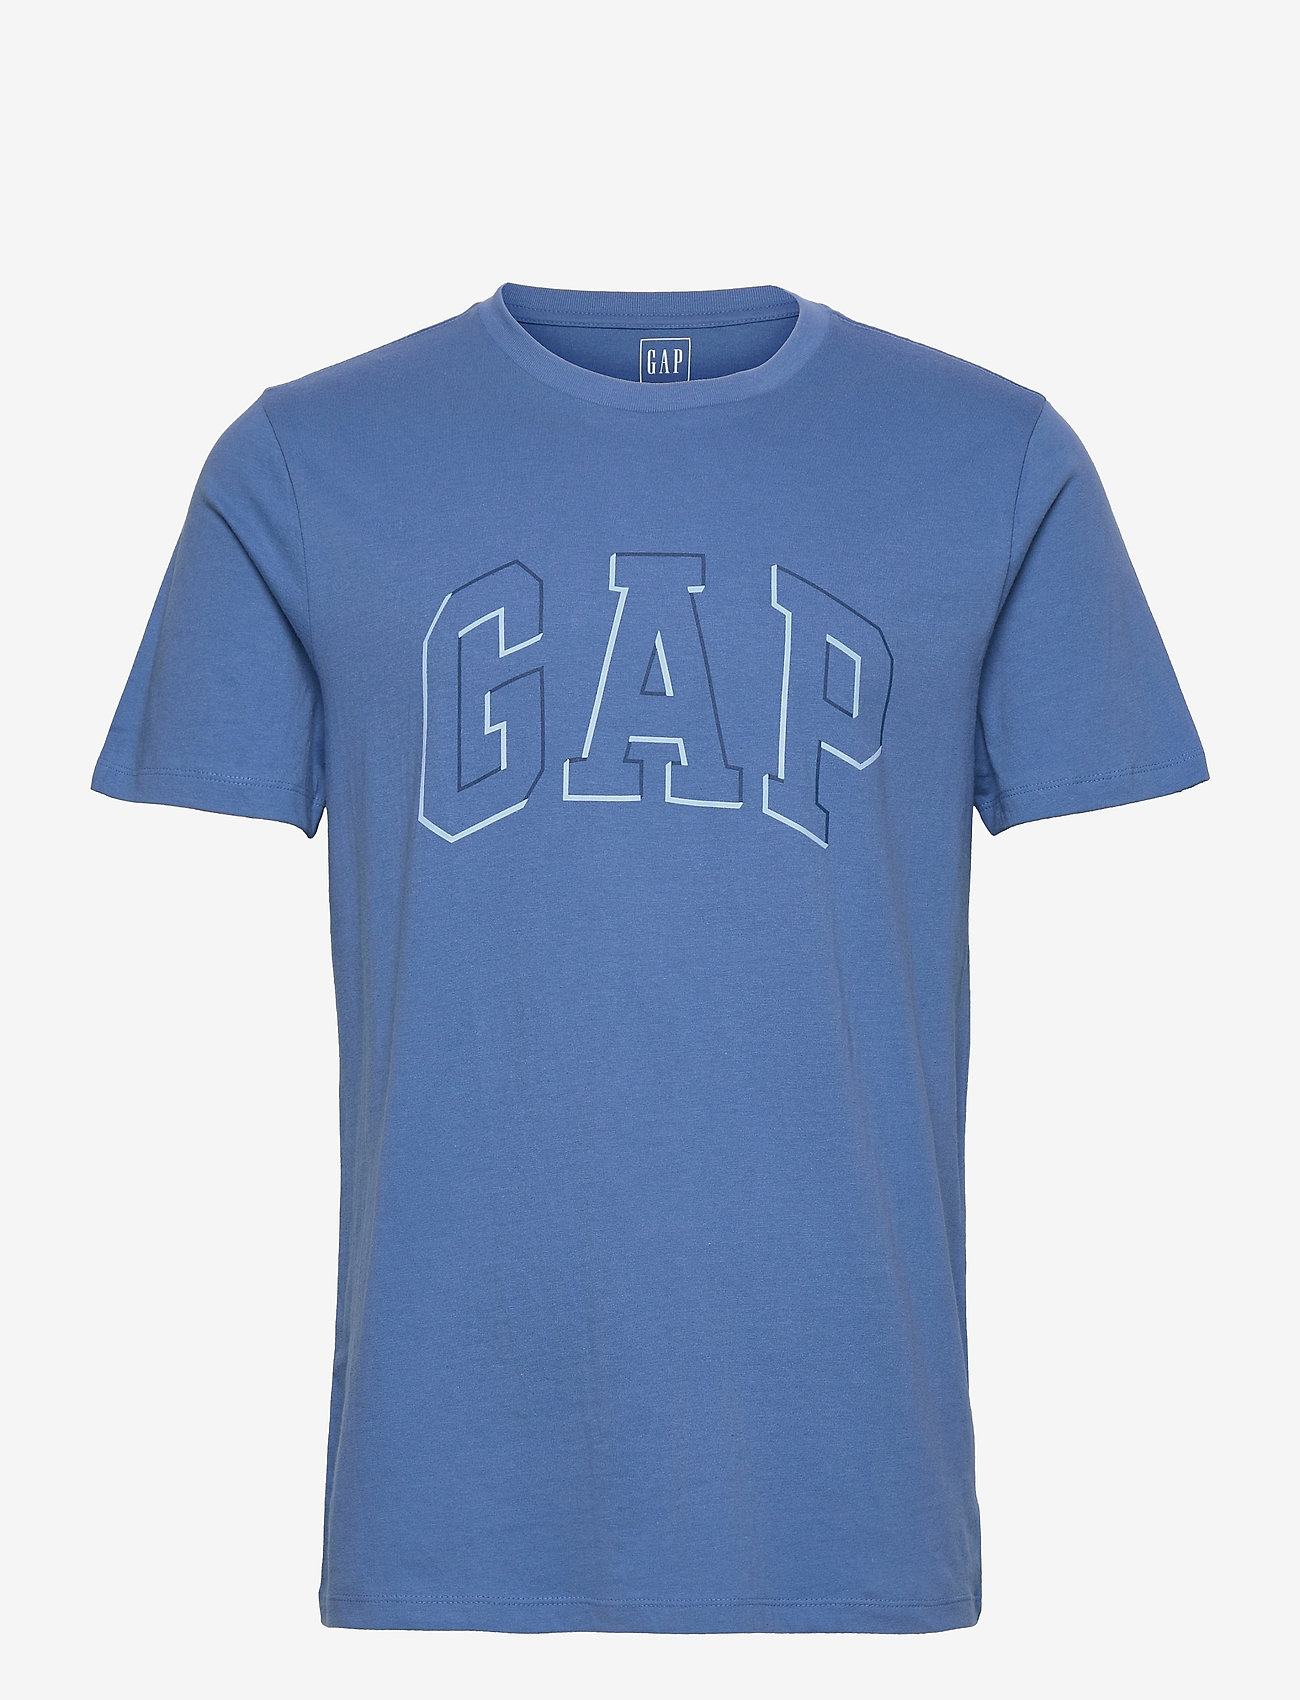 GAP - RAISED ARCH T - t-shirts à manches courtes - northern blue 330-540 - 0